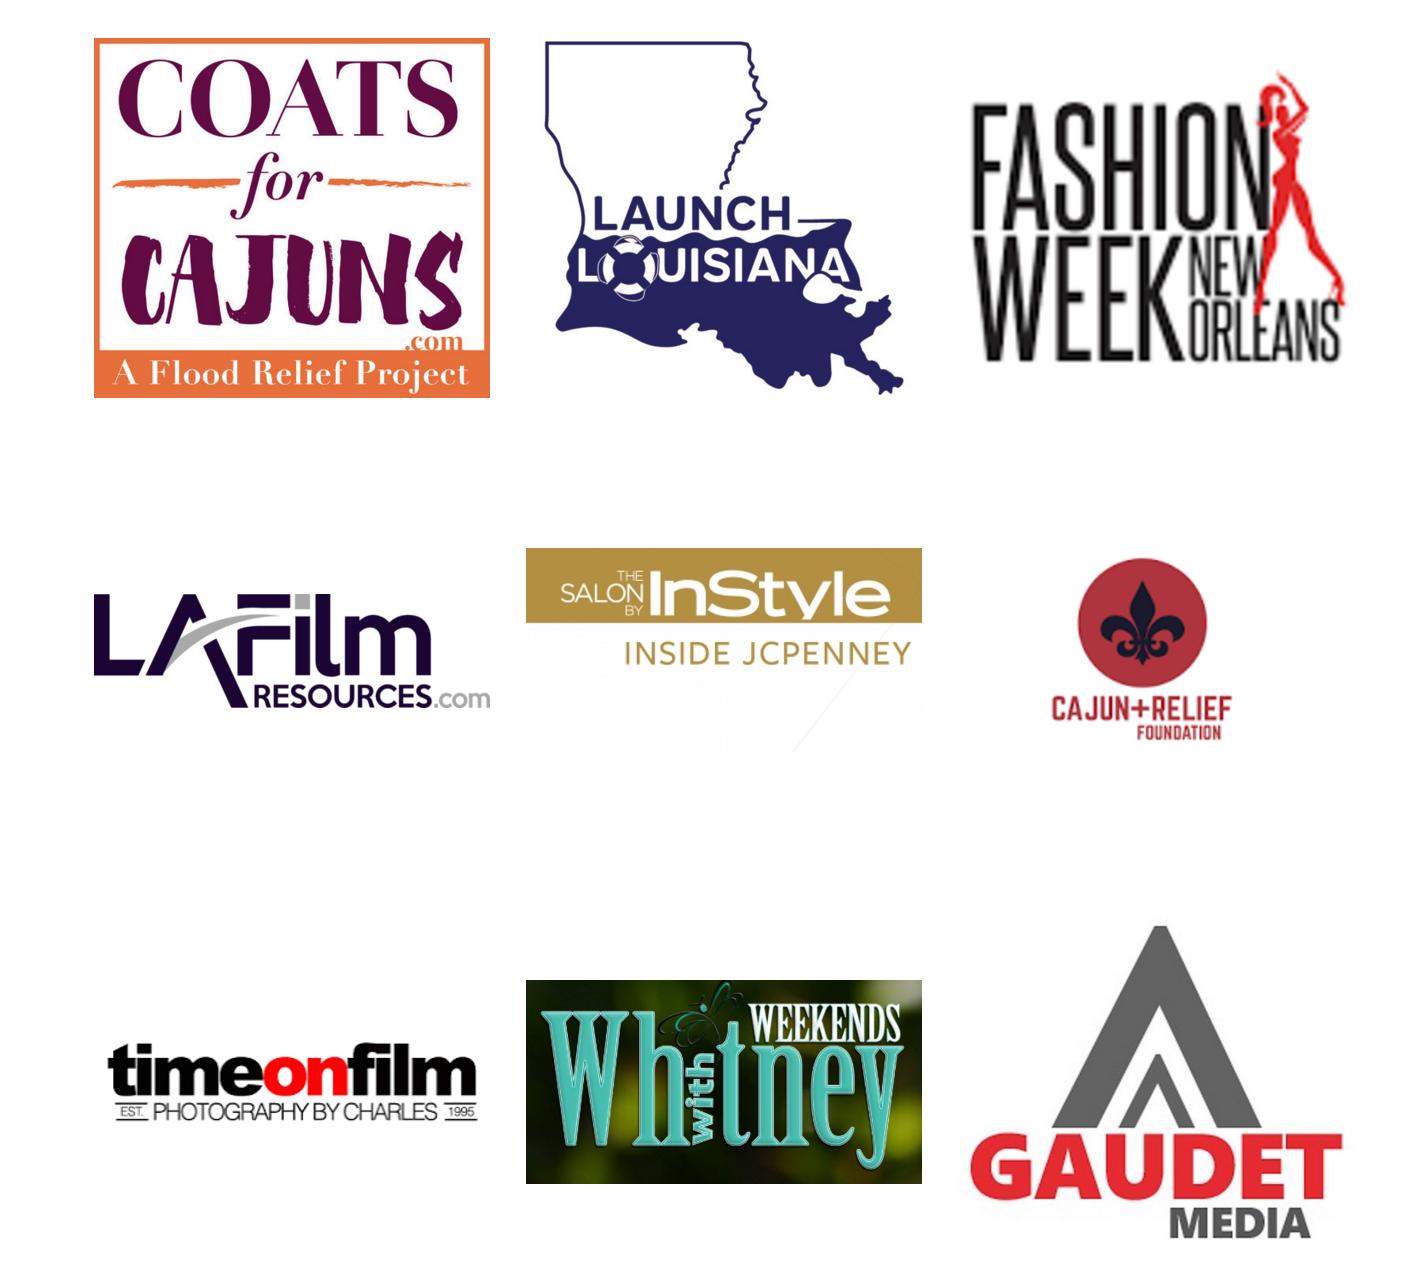 NOLA Fashion Week x 'Coats for Cajuns'